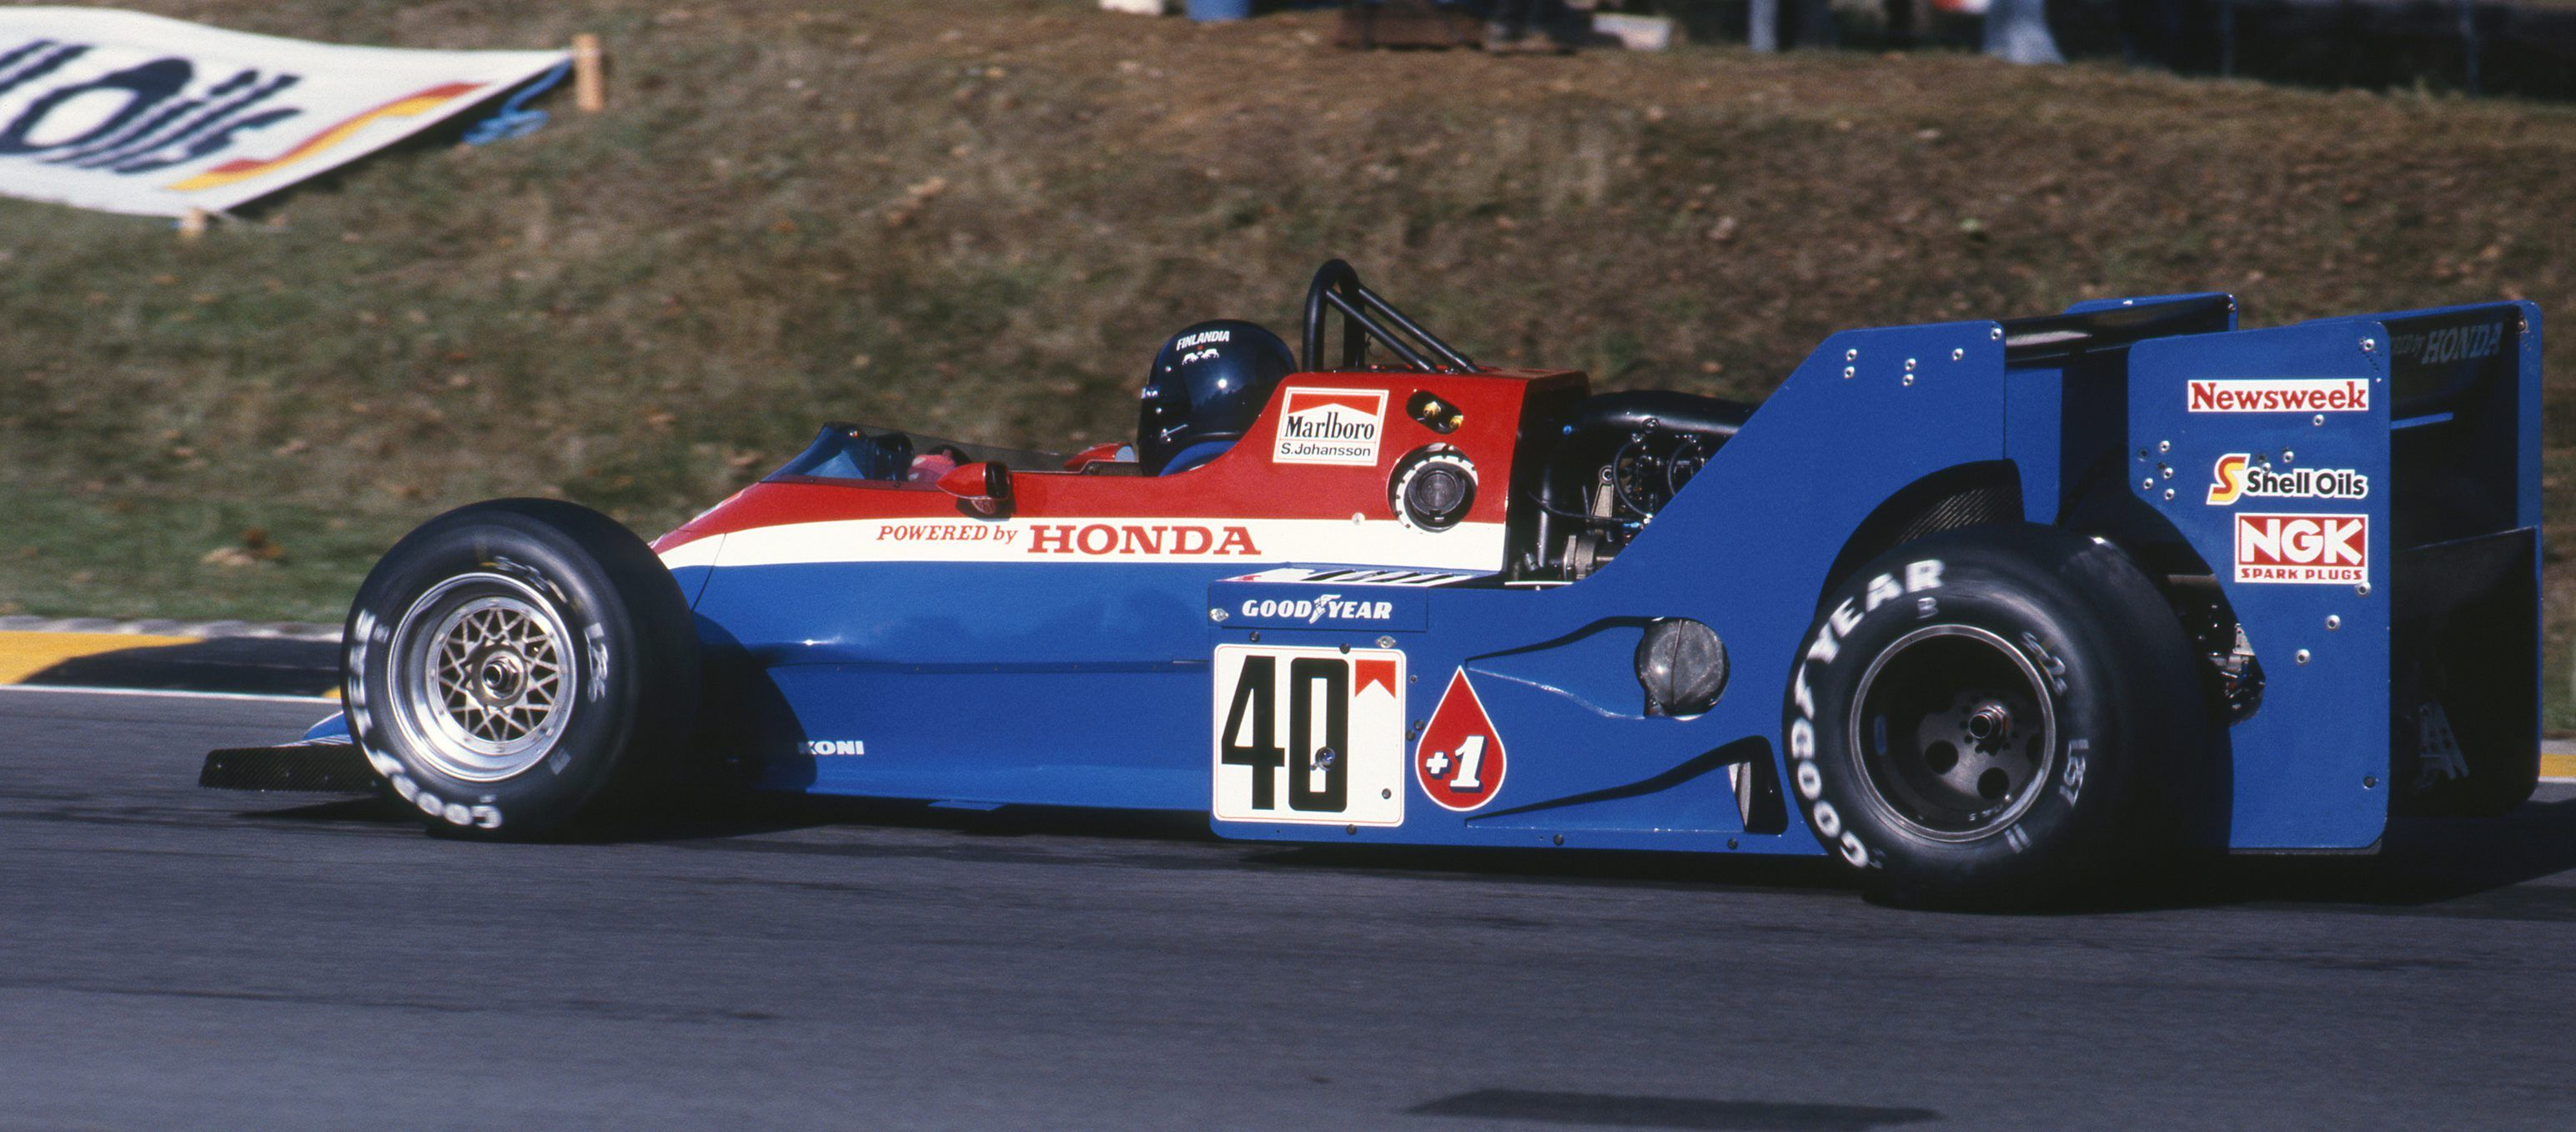 Stefan Johansson Qualifying the Spirit-Honda in the European GP at Brands Hatch 1983